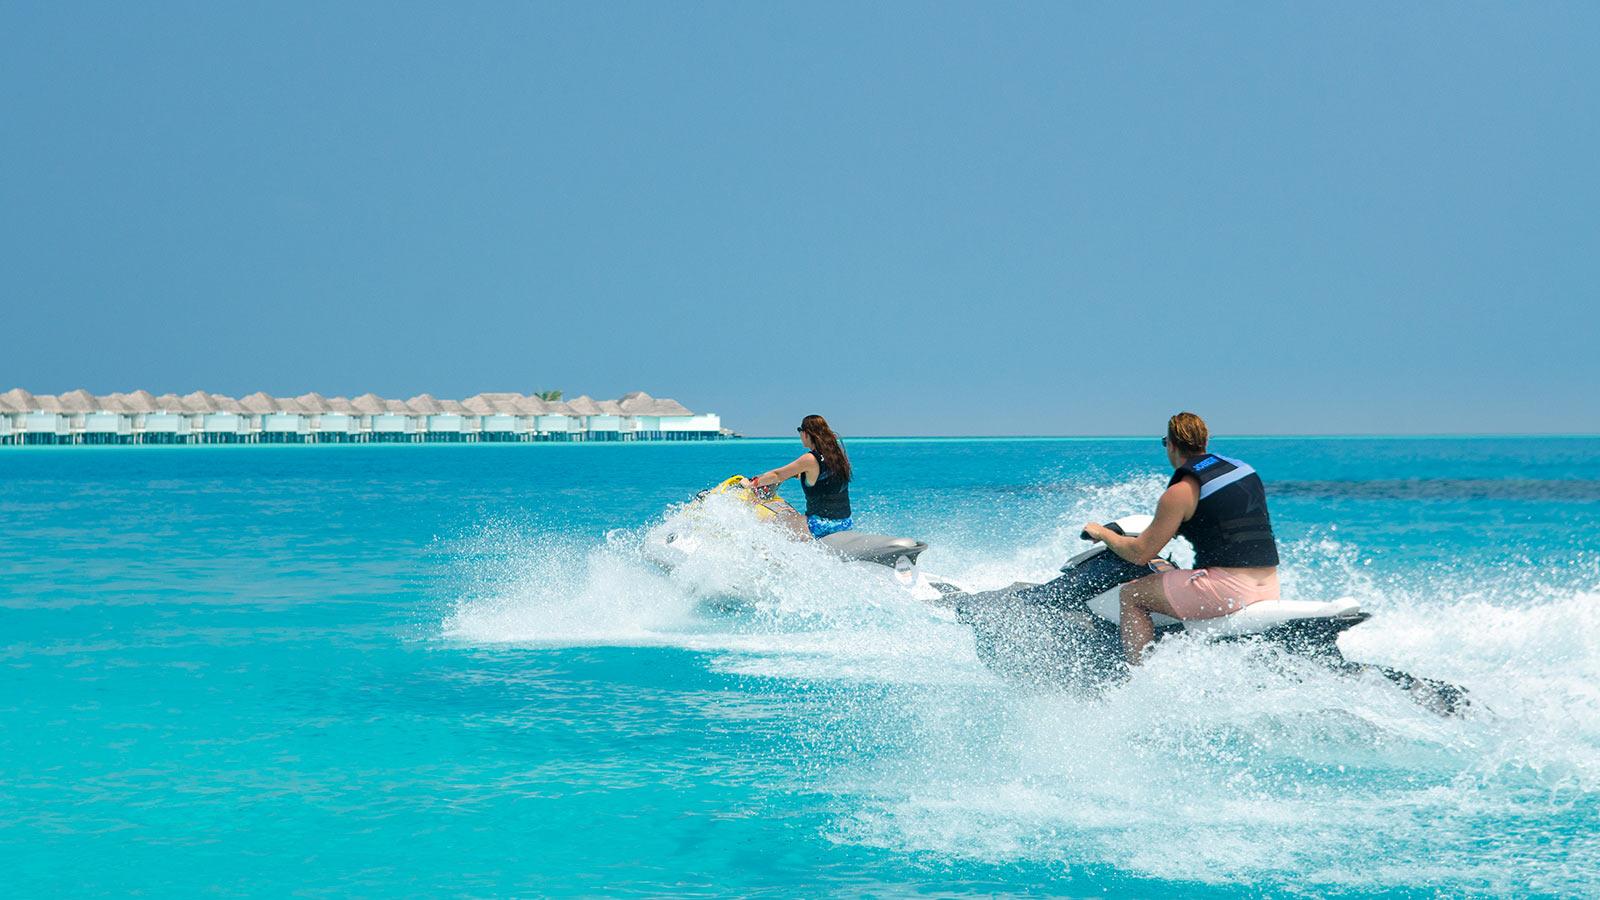 Maldives watersports jet ski